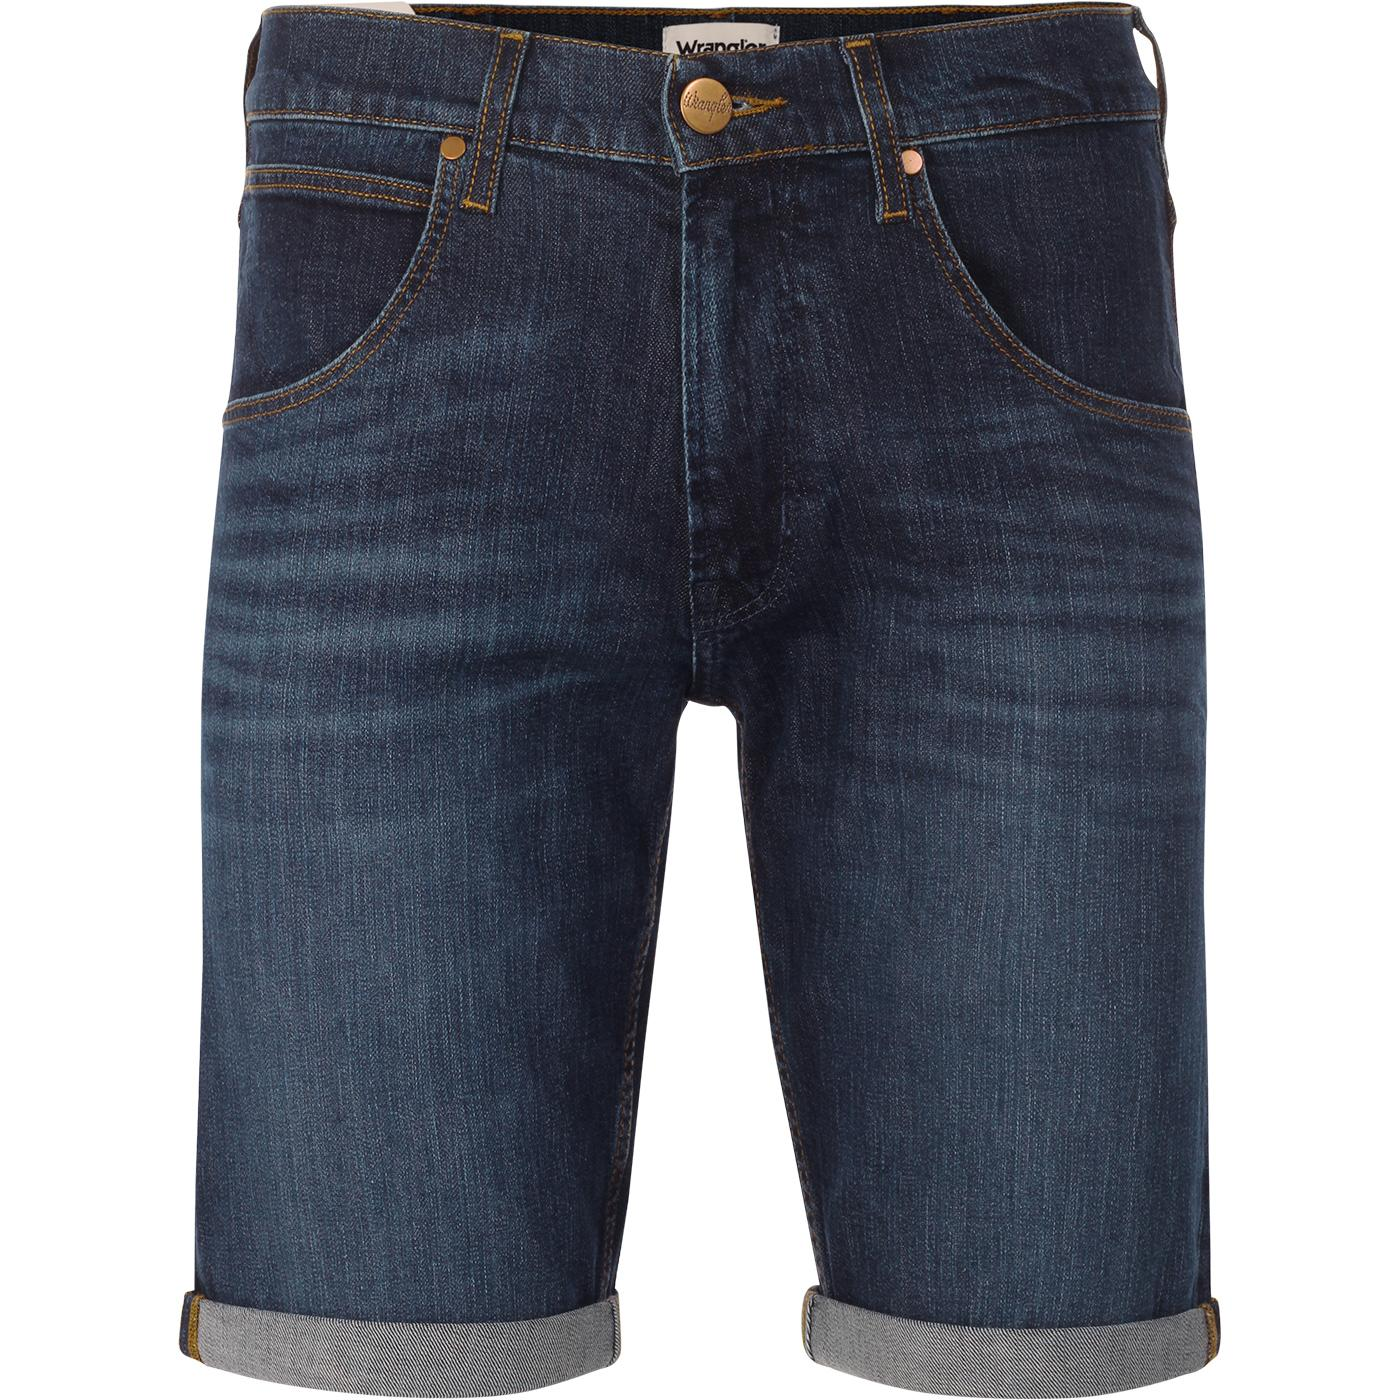 Colton WRANGLER Turn Up Denim Shorts (The Legend)